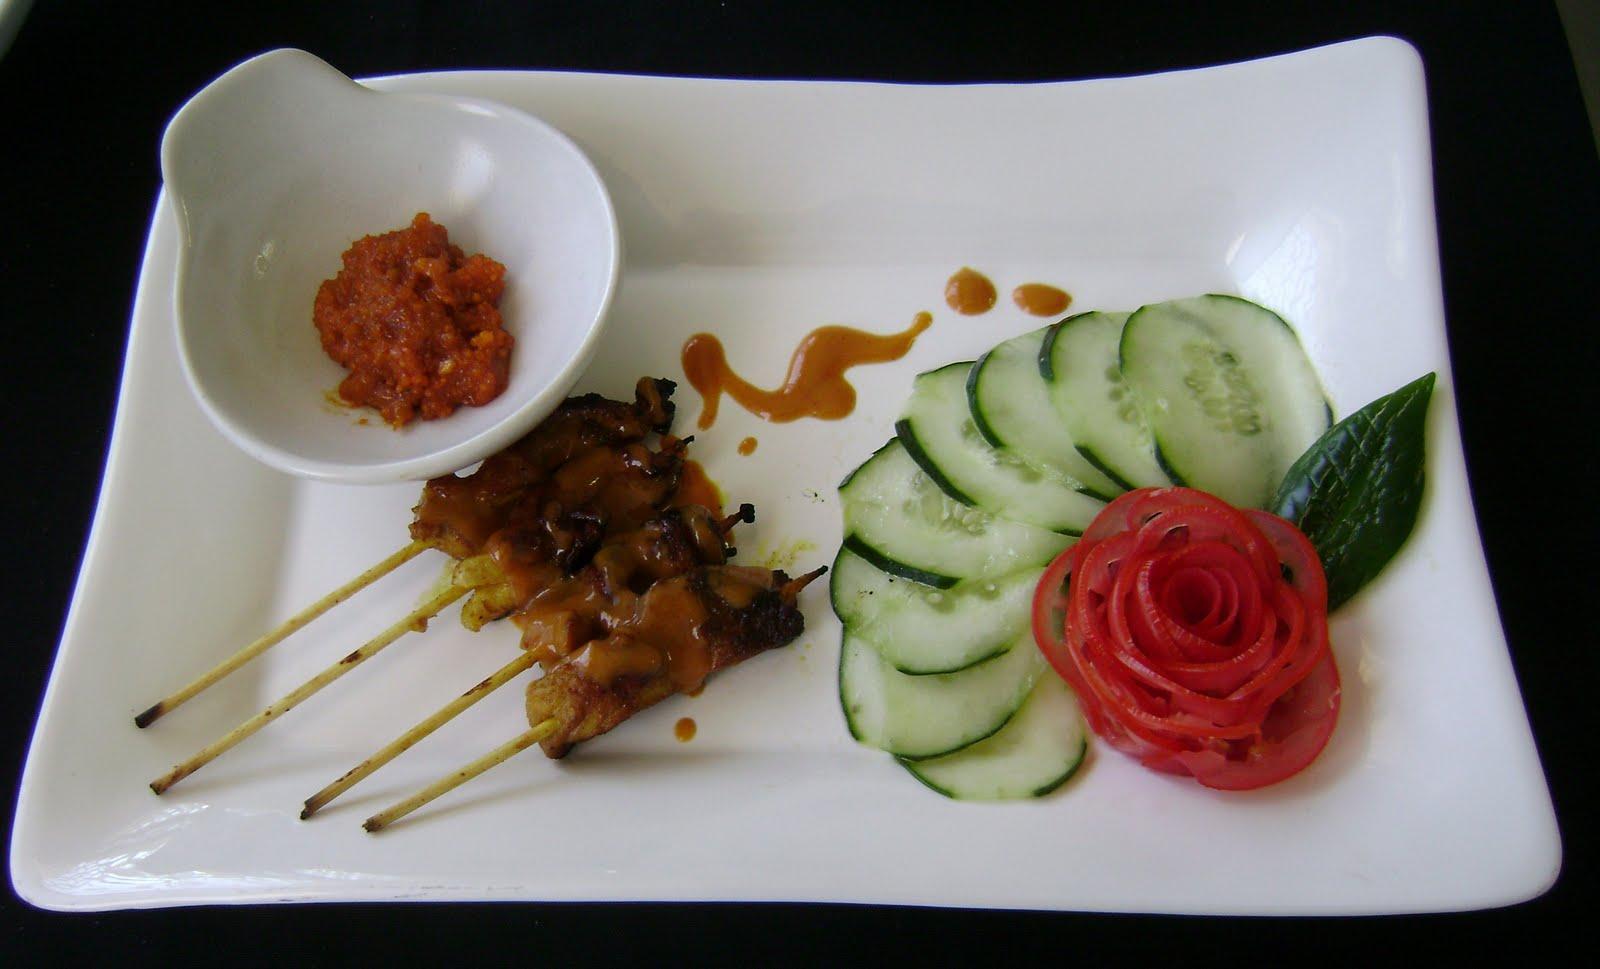 Banquetes eventos bodas y cumplea os comidas gourmet - Decoracion de platos ...